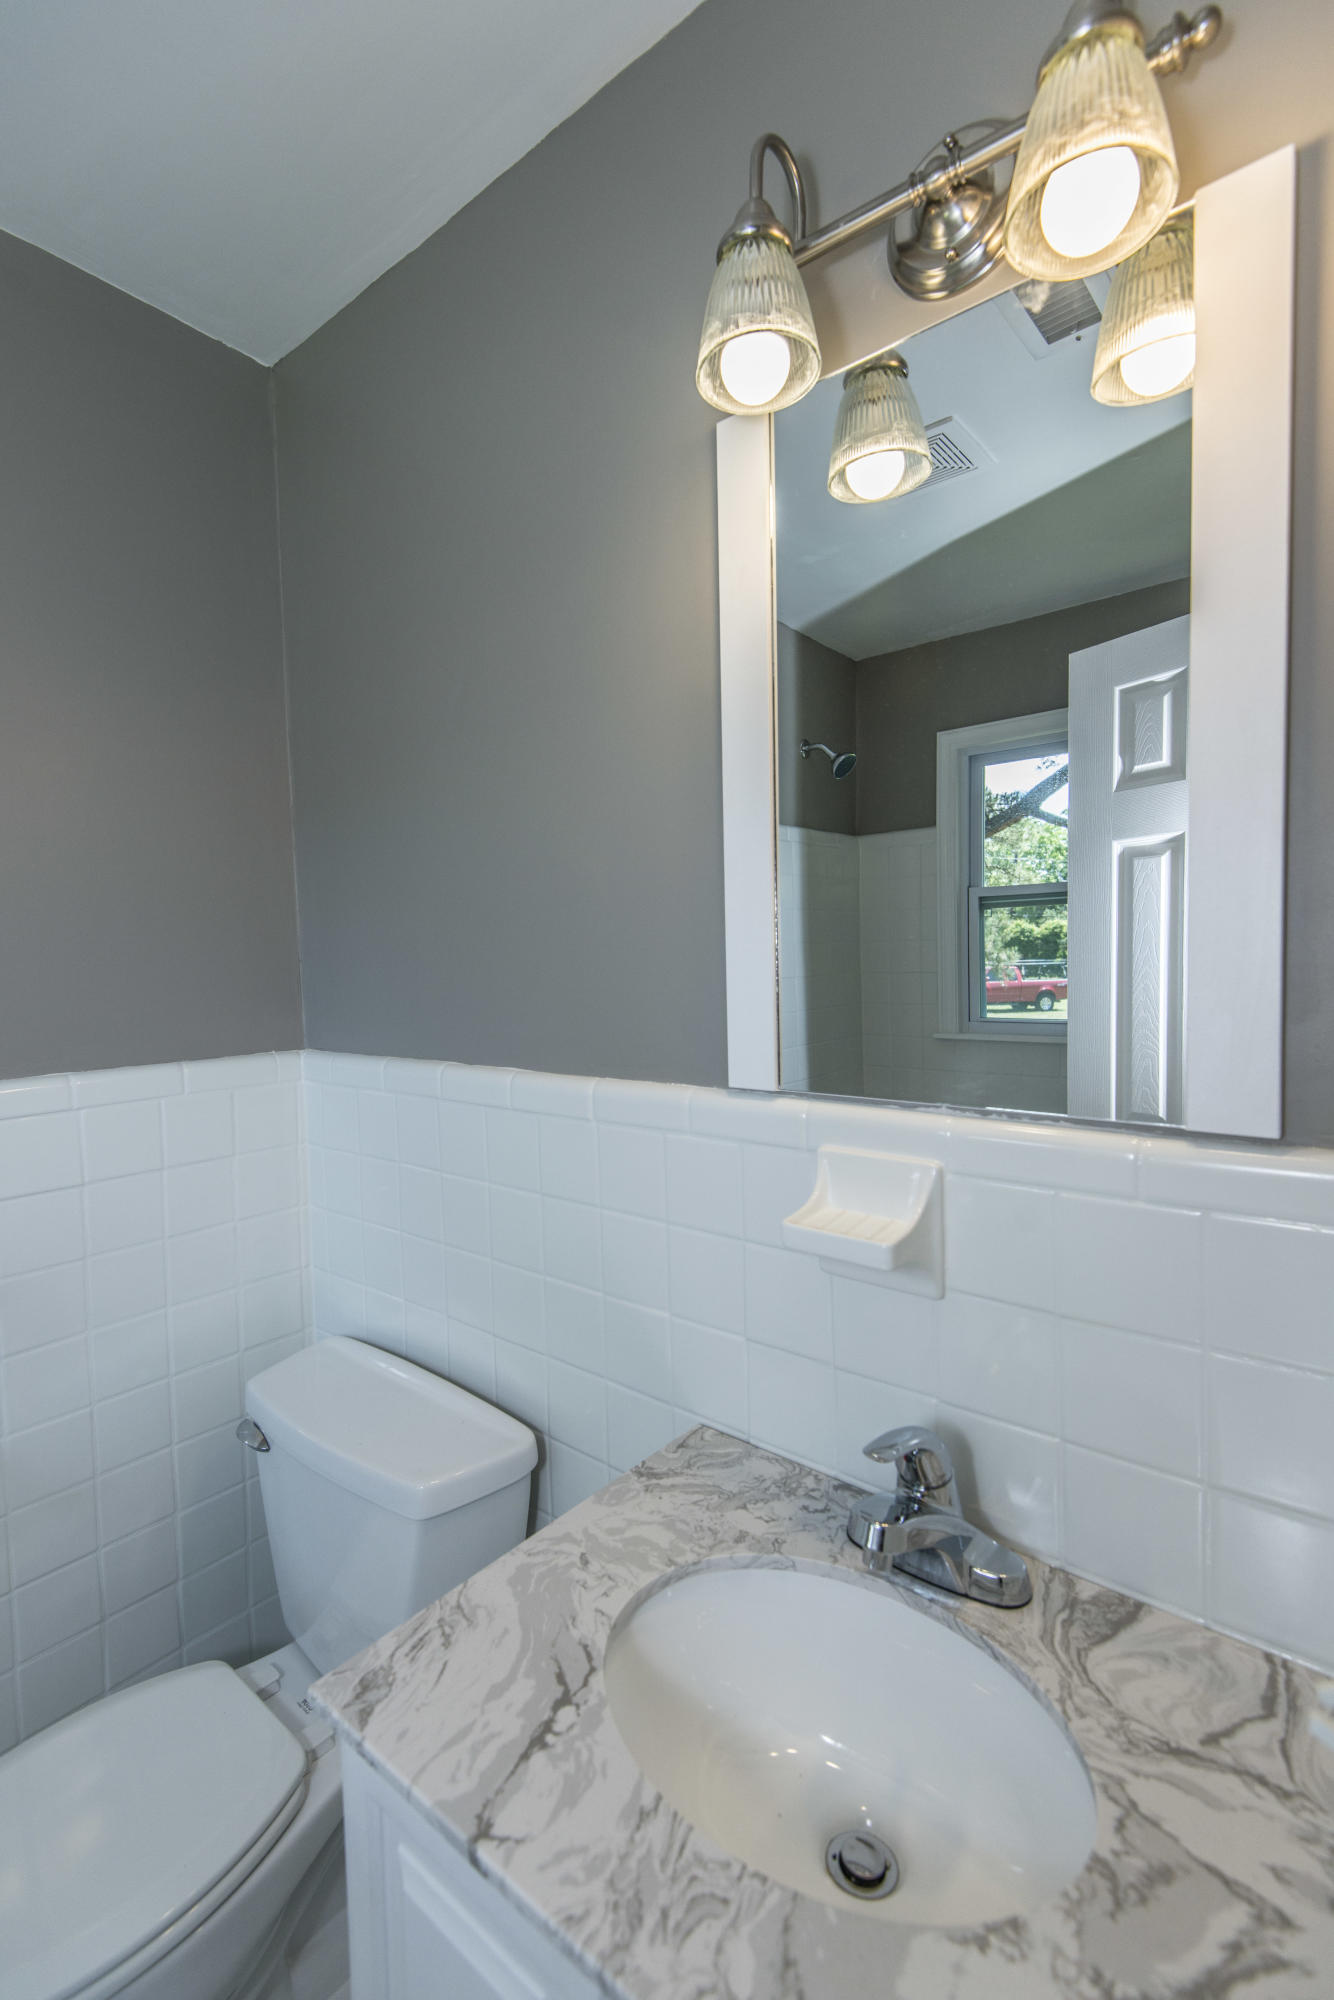 Washington Park Homes For Sale - 1337 5th, Charleston, SC - 5